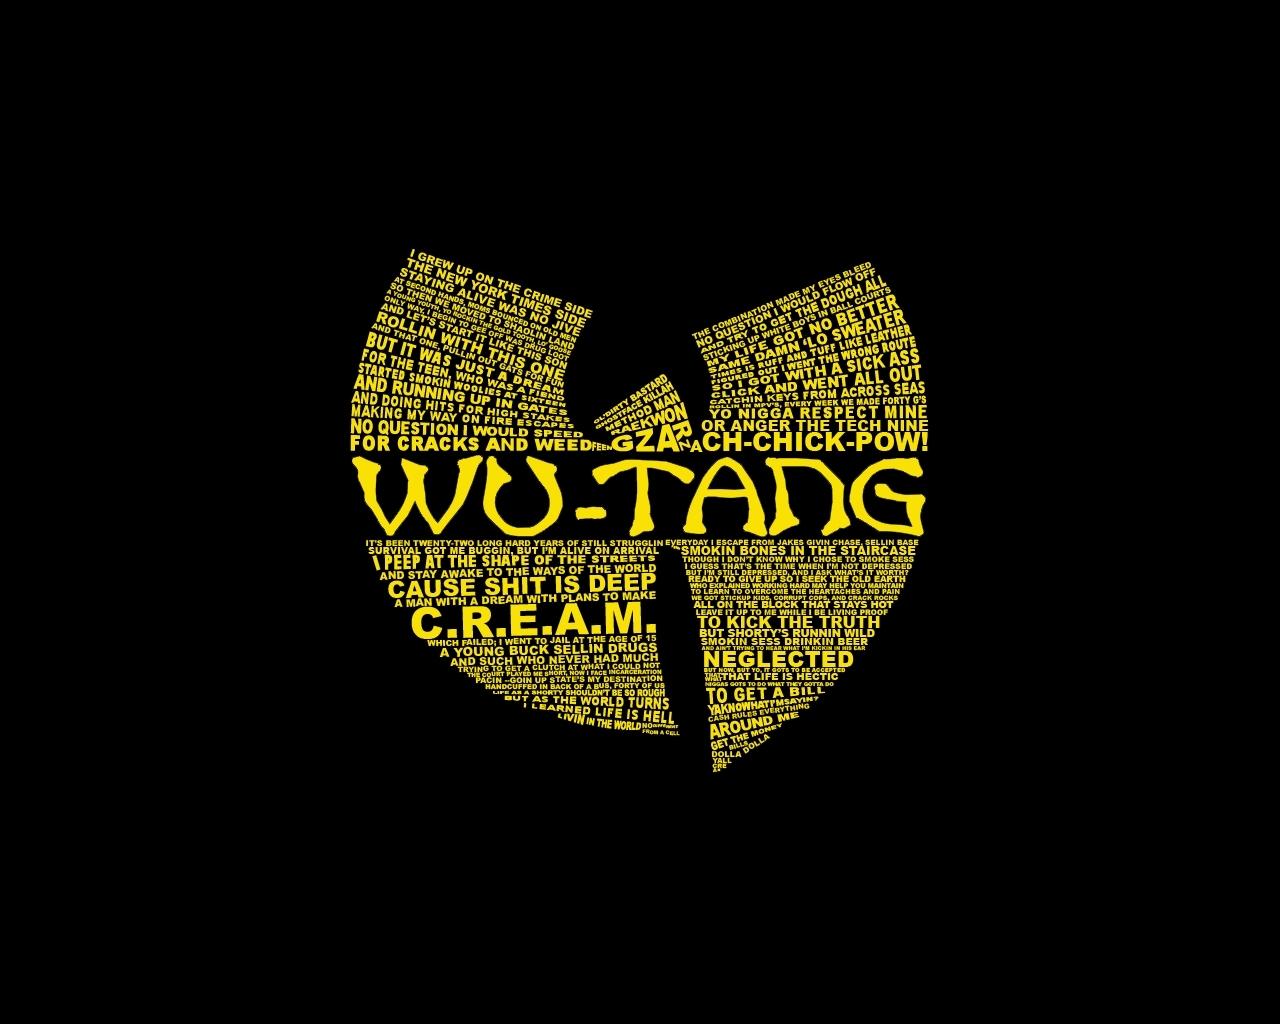 wu tang clan wallpapers - wallpapervortex